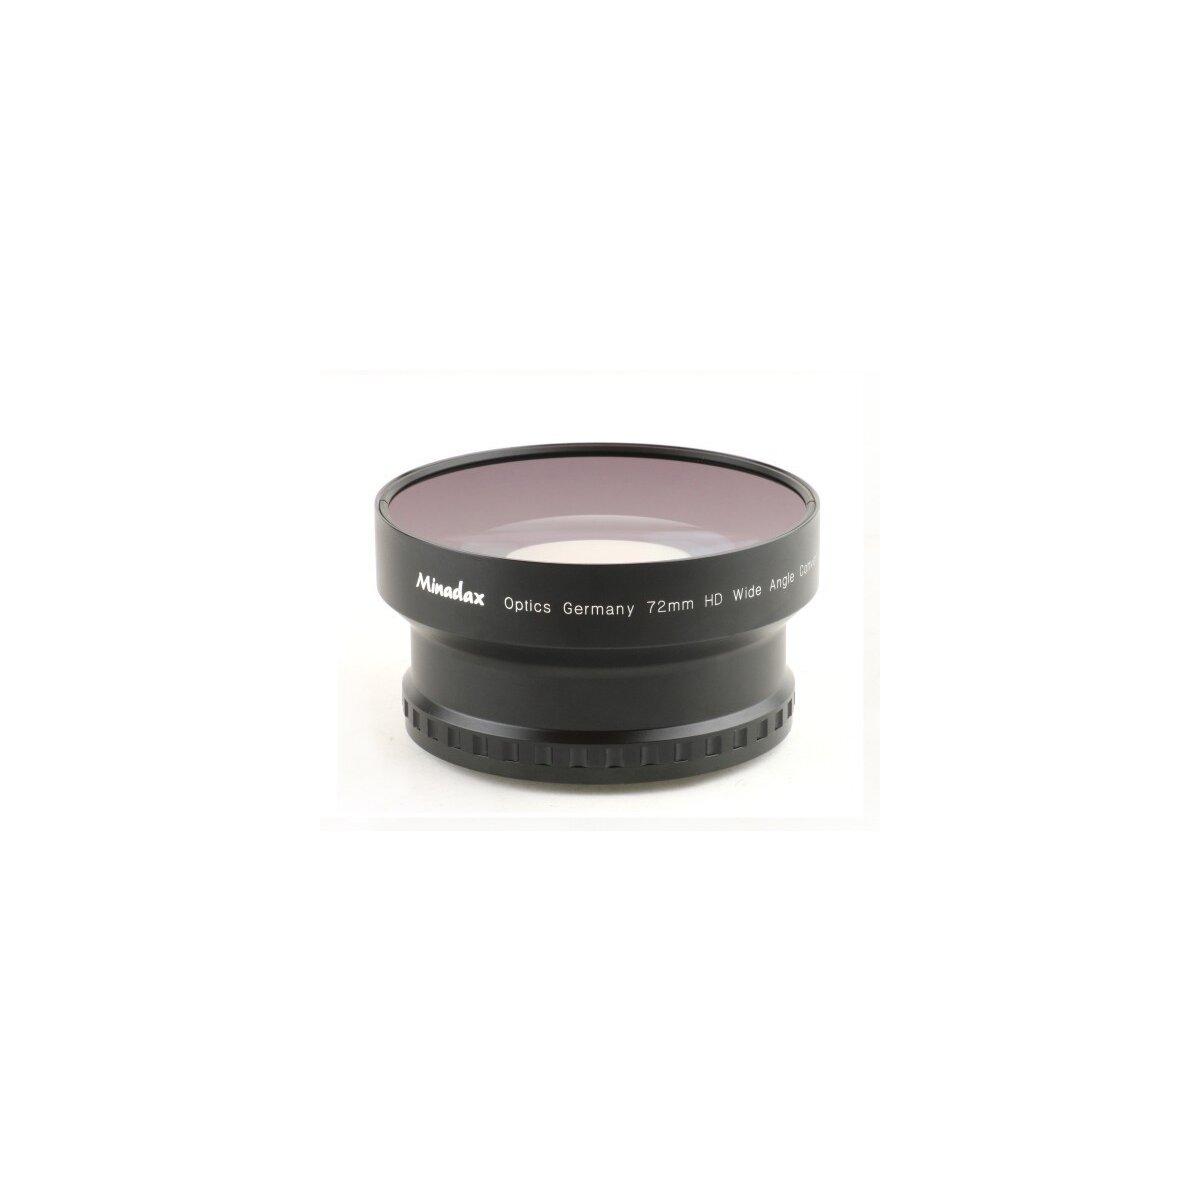 0.7x Minadax HD Weitwinkel Objektiv Vorsatz für Panasonic AG-DVX100, AG-DVX100A, AG-DVX100B, AG-HVX100, AG-HPX170 US Version, AG-HPX171 EU Version, AG-HMC151 (Voll durchzoombar)